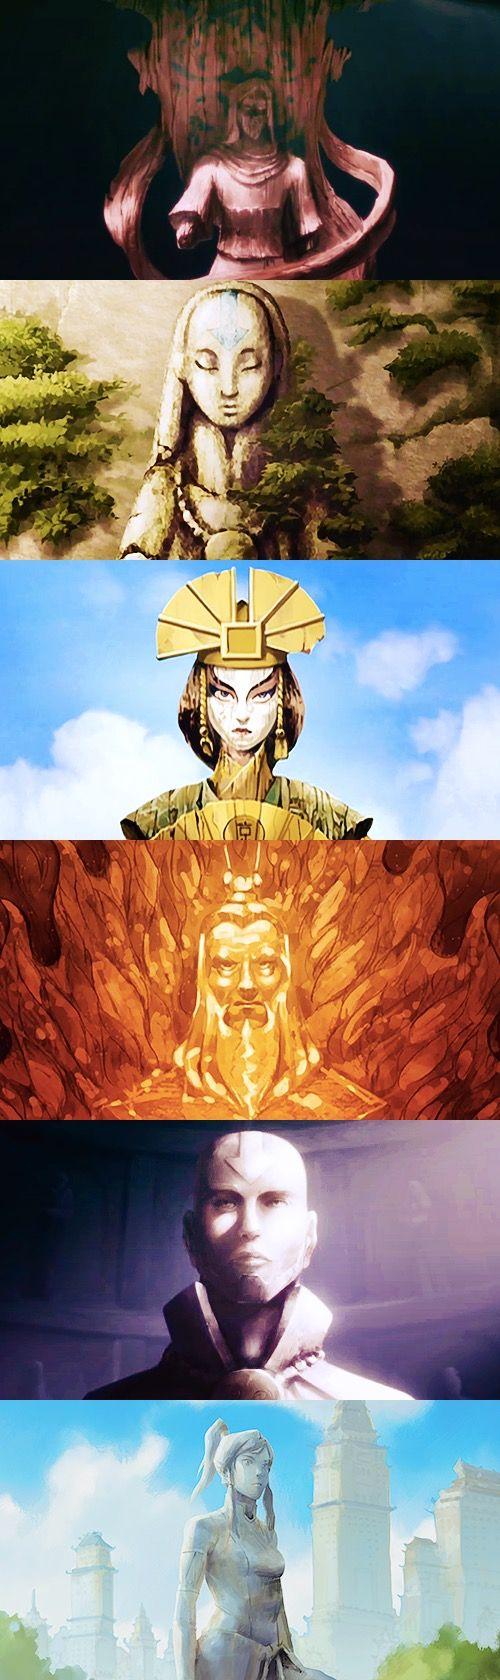 Avatar Statues (Wan, Yangchen, Kyoshi, Roku, Aang, and Korra)